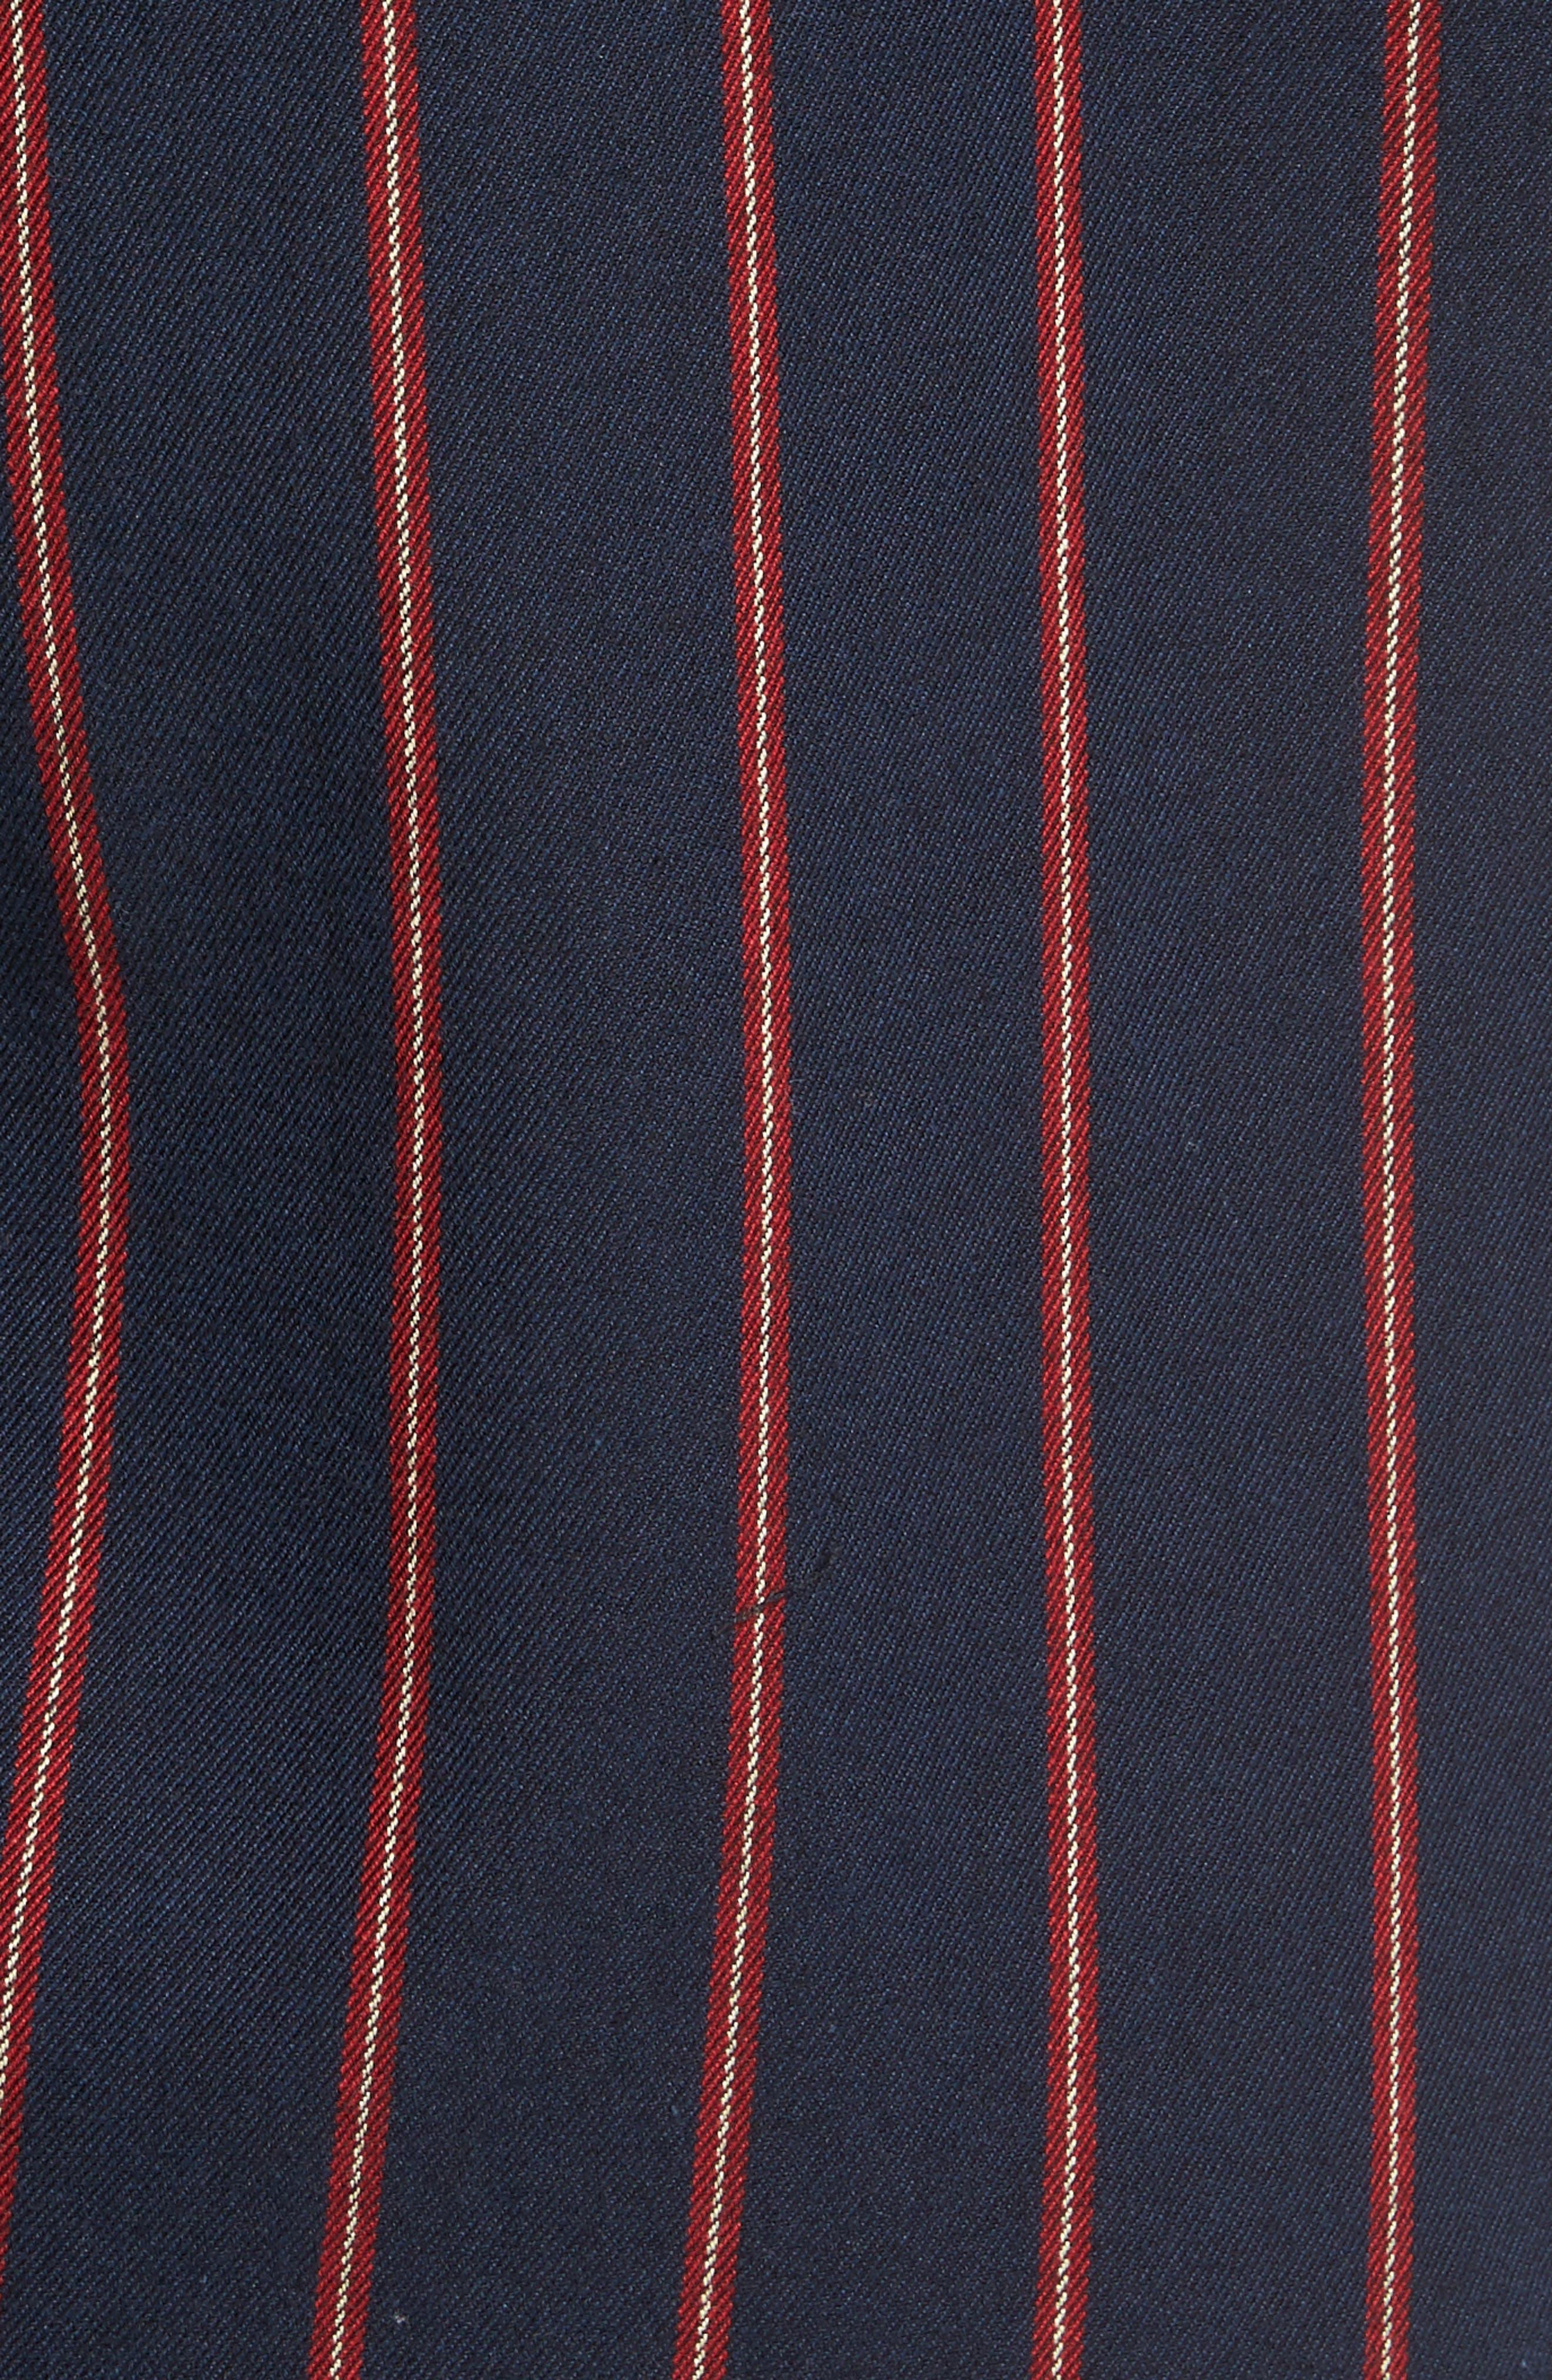 The Rail Long Sleeve Twill Shirt,                             Alternate thumbnail 5, color,                             Navy Peacoat Red Stripe